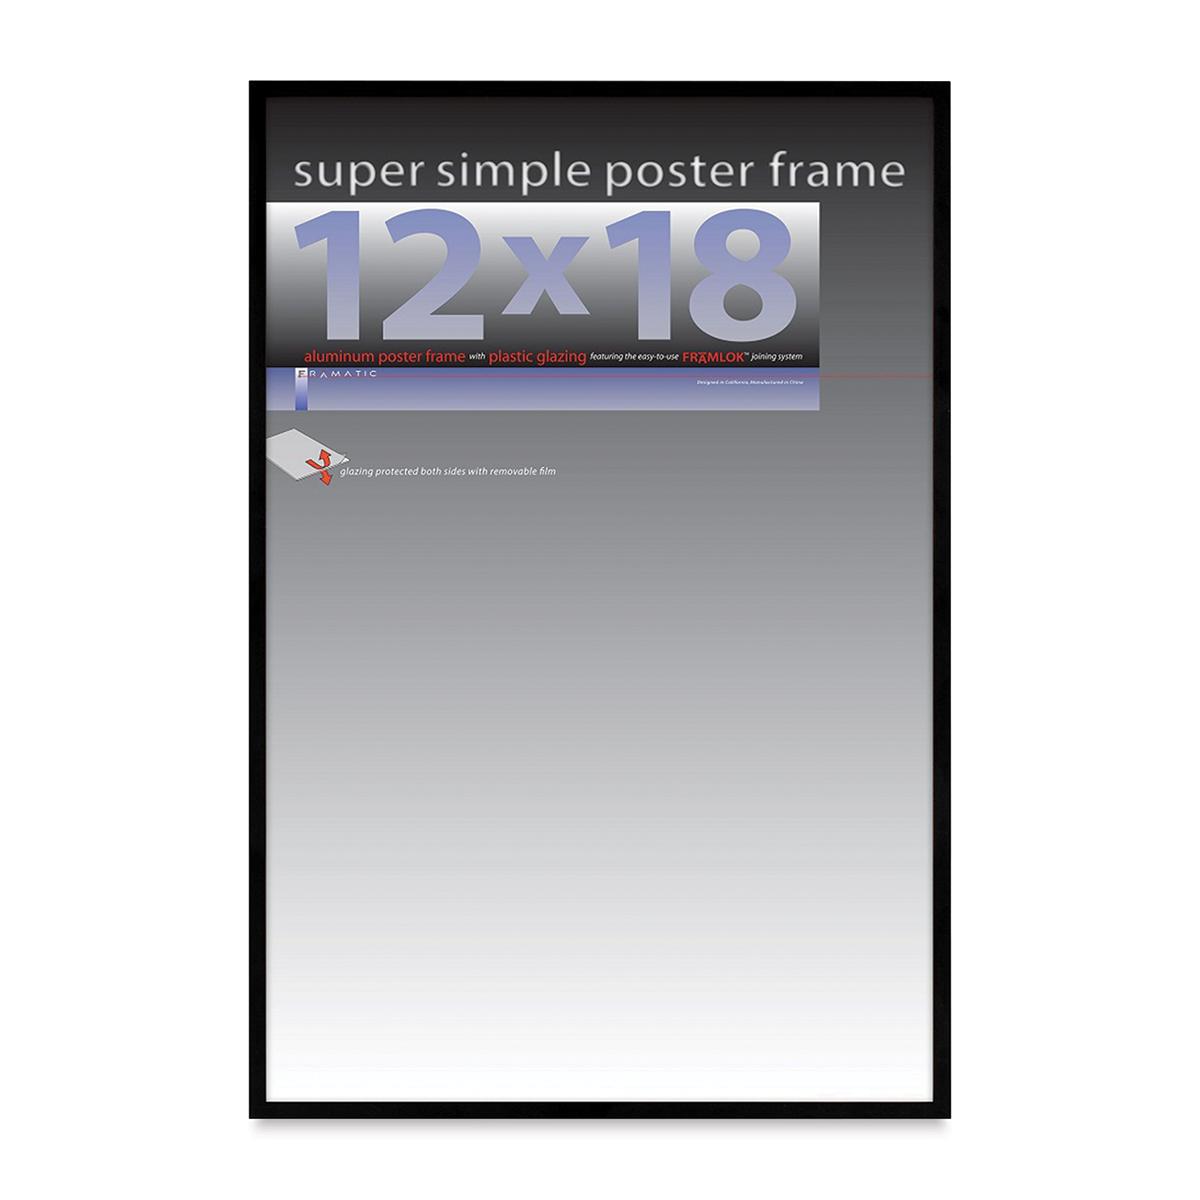 Framatic Super Simple Poster Frame - Black, 12 x 18